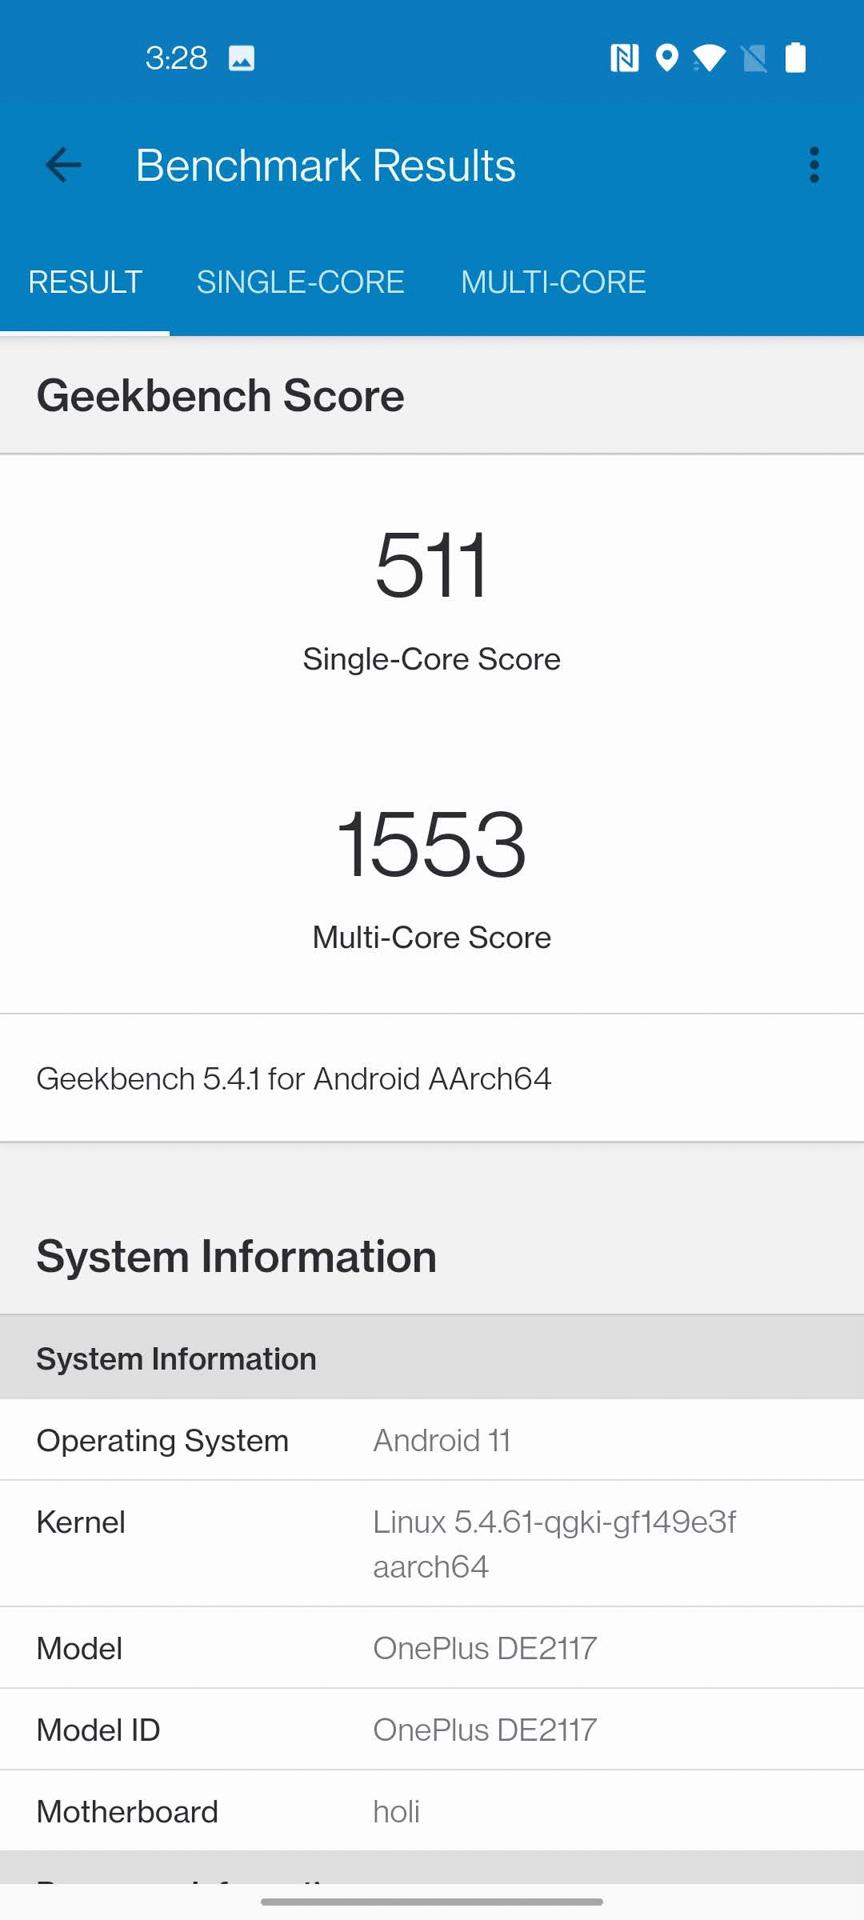 OnePlus Nord N200 5G Geekbench 5